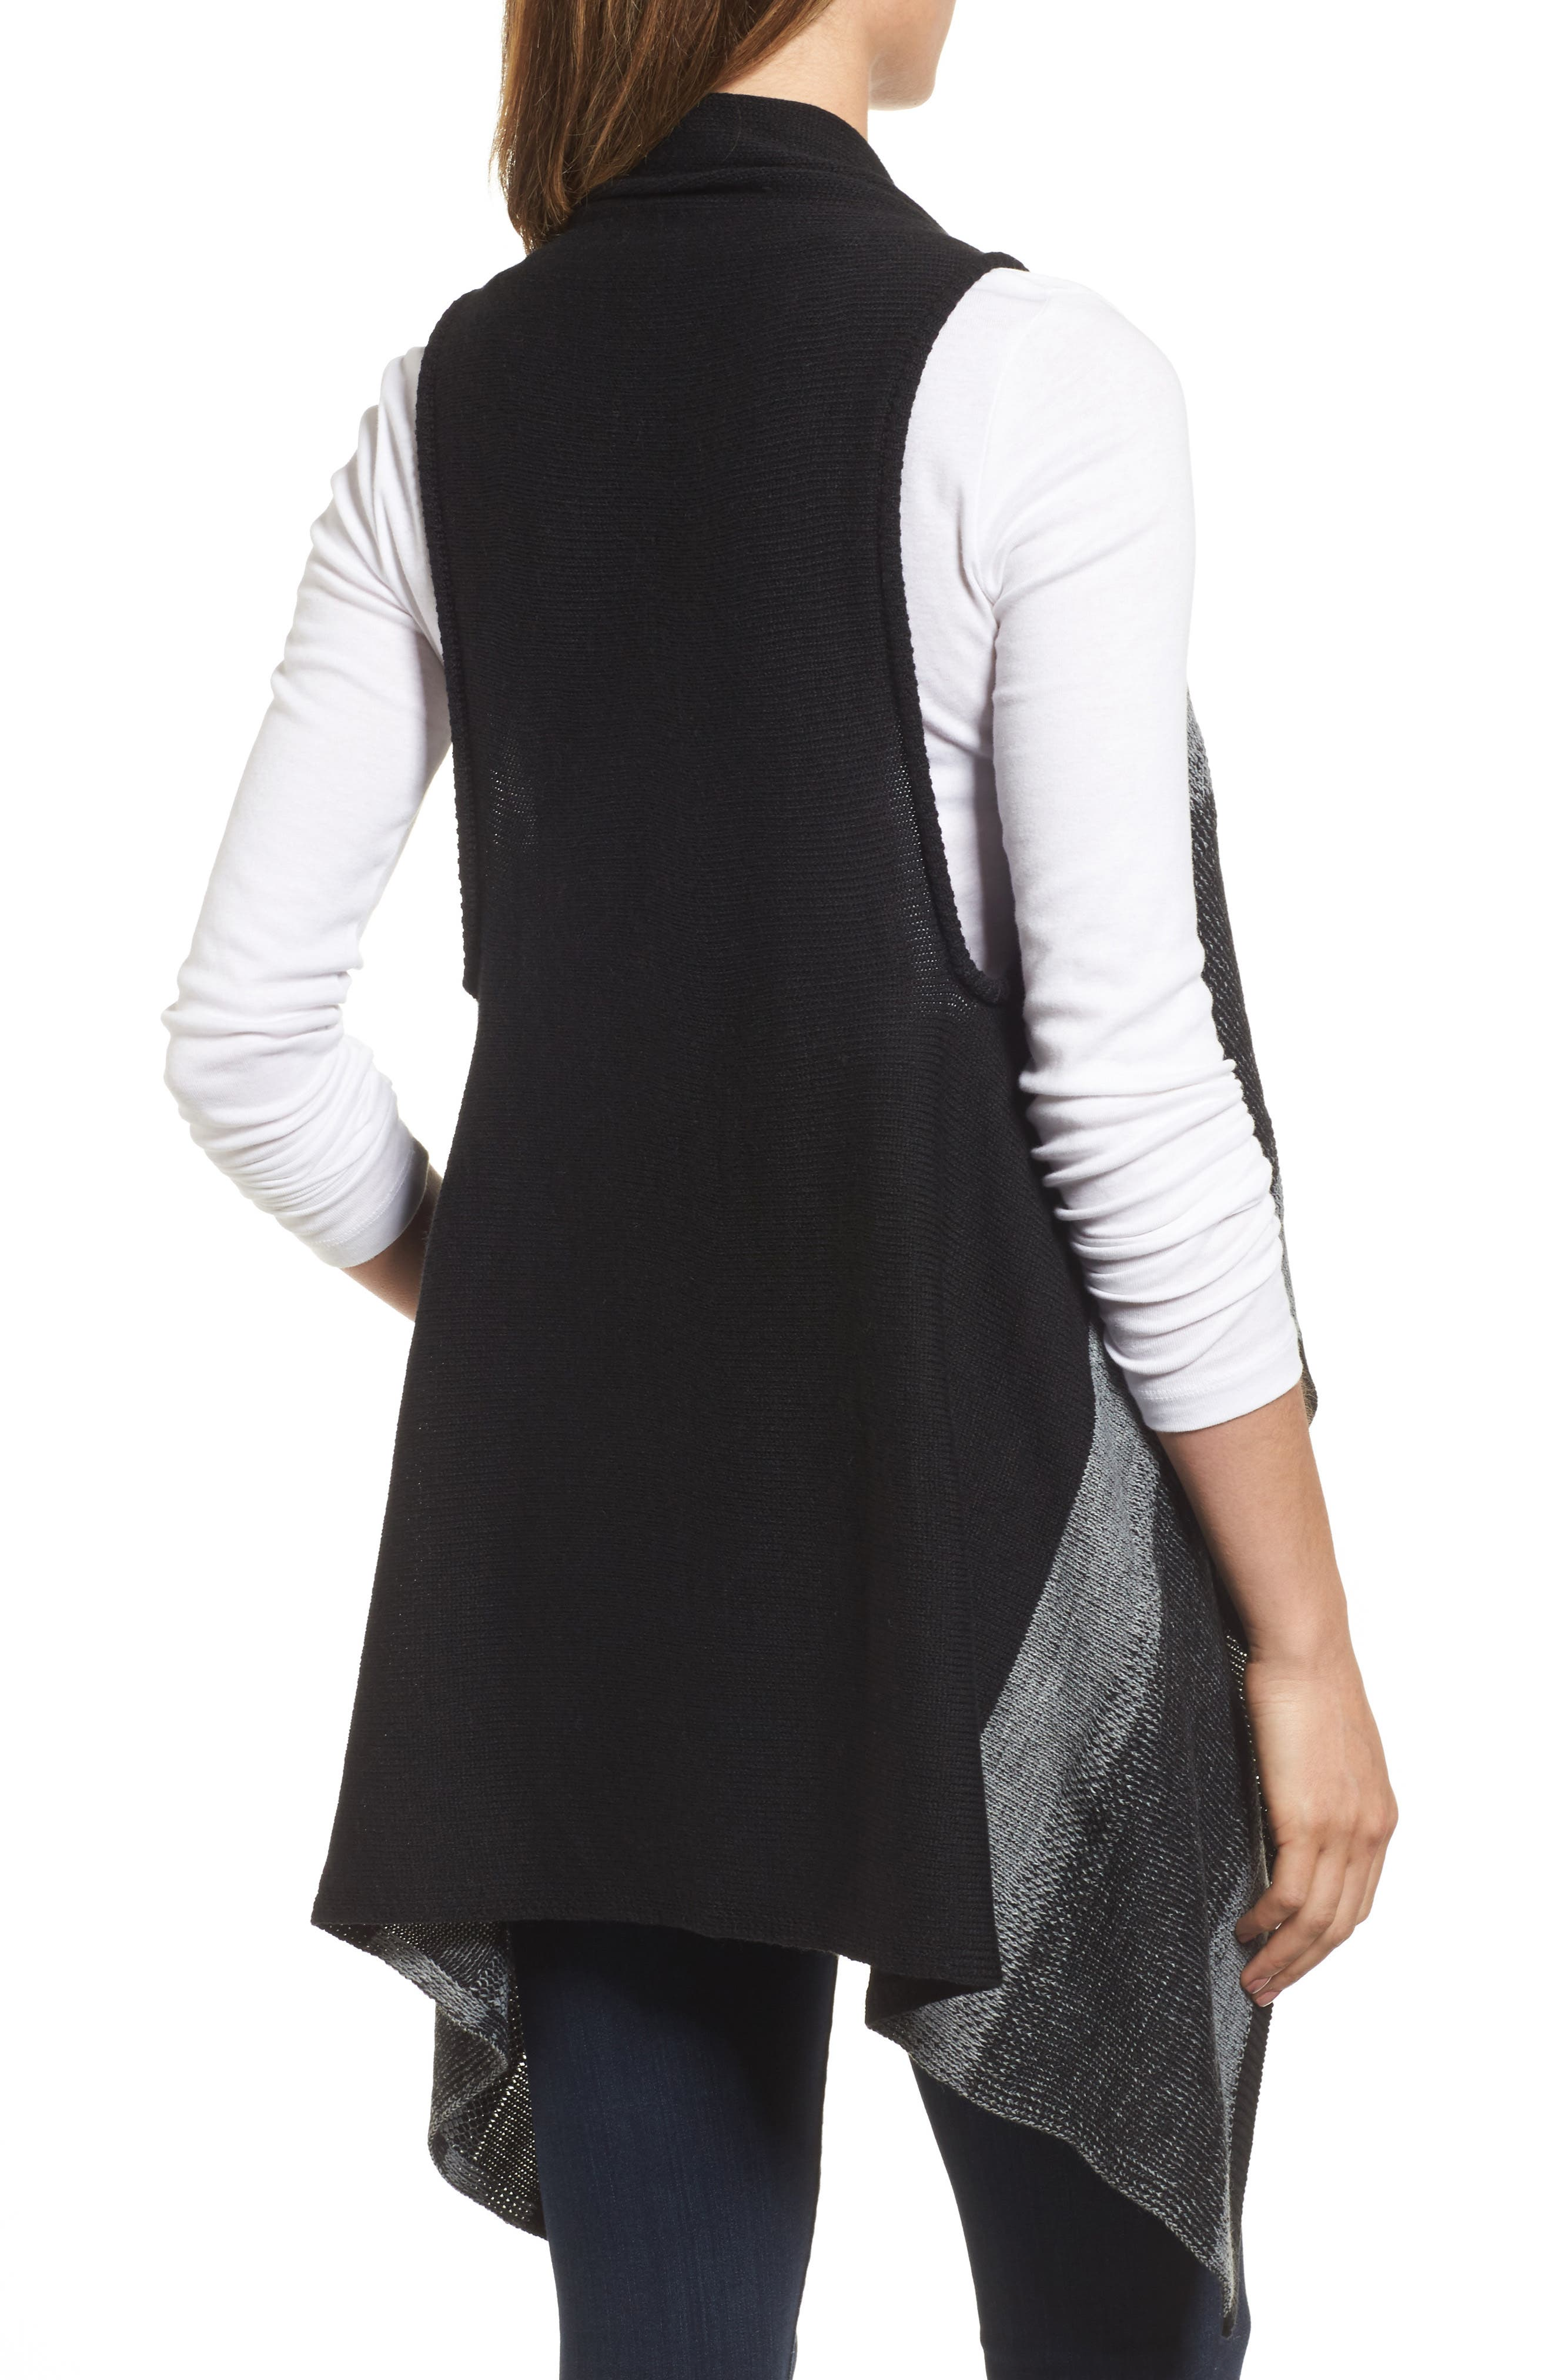 Faded Stripes Knit Vest,                             Alternate thumbnail 2, color,                             001